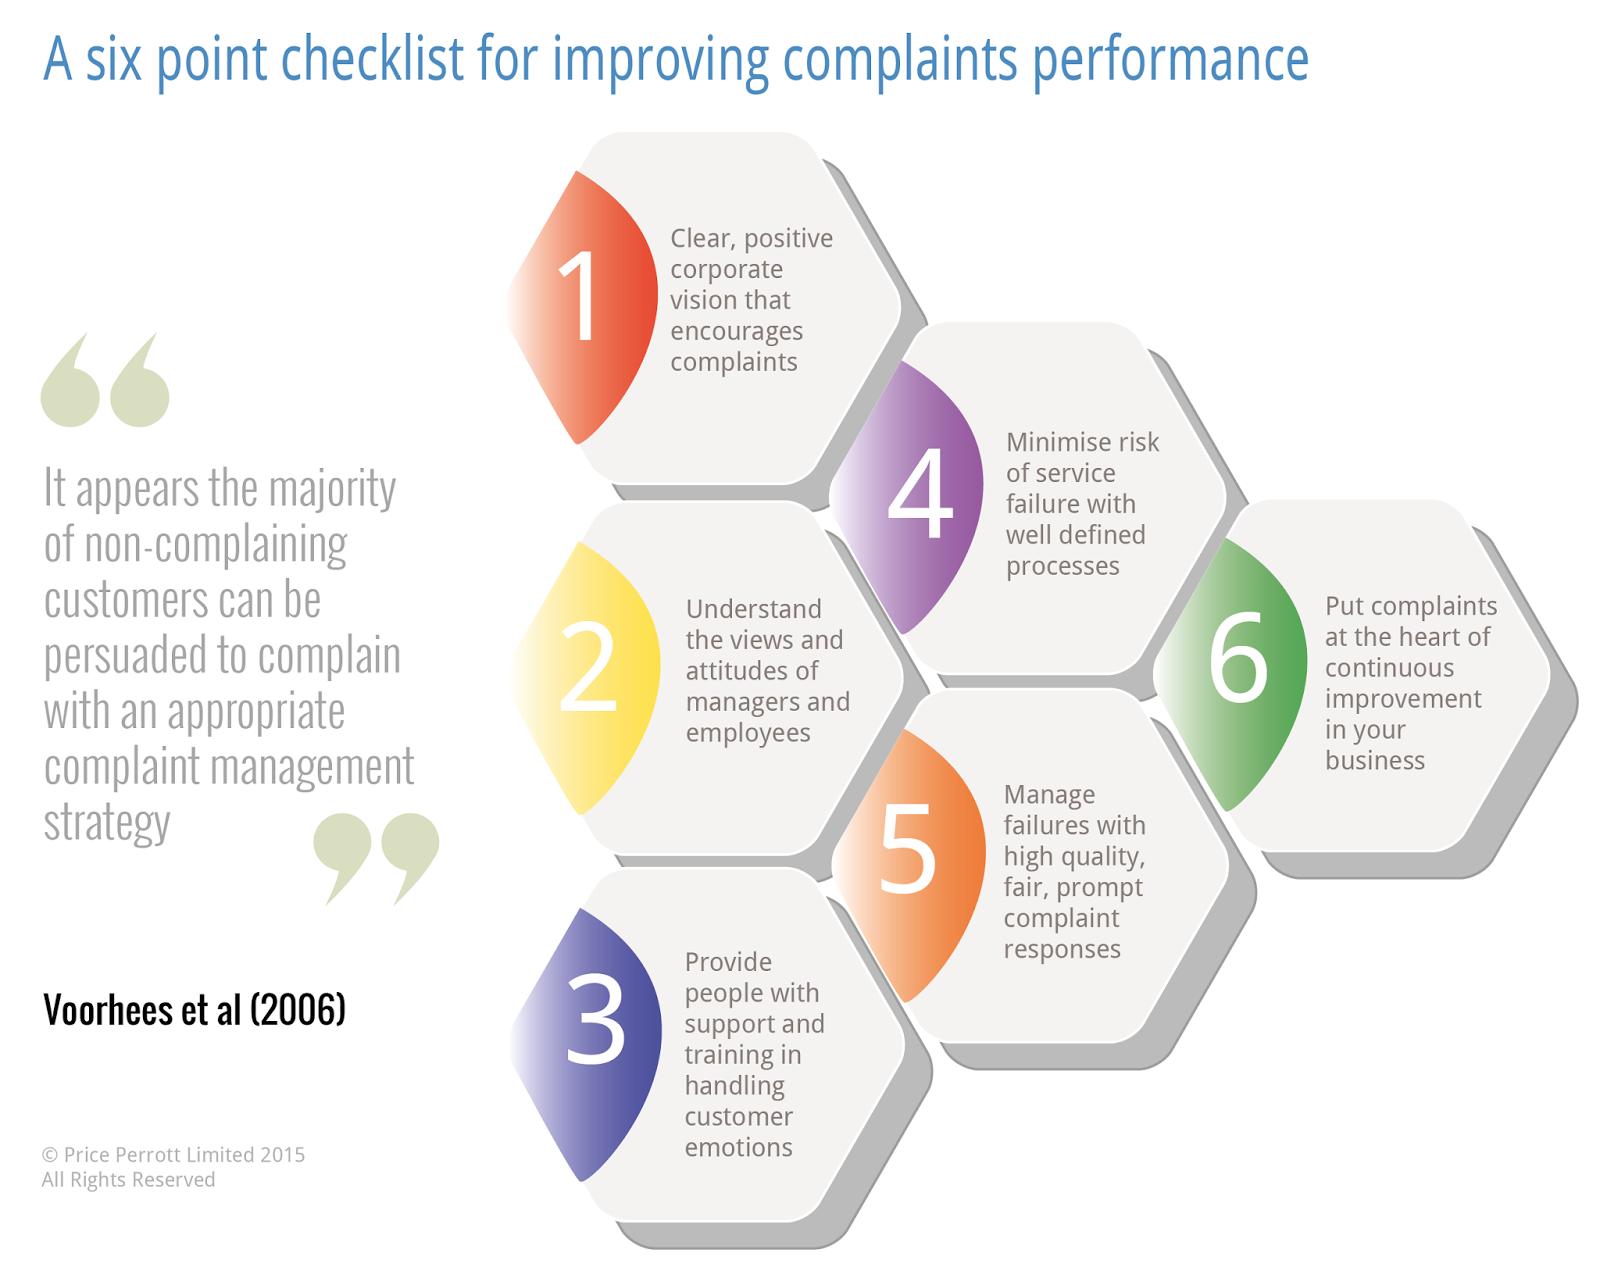 Customer service standards at organisations